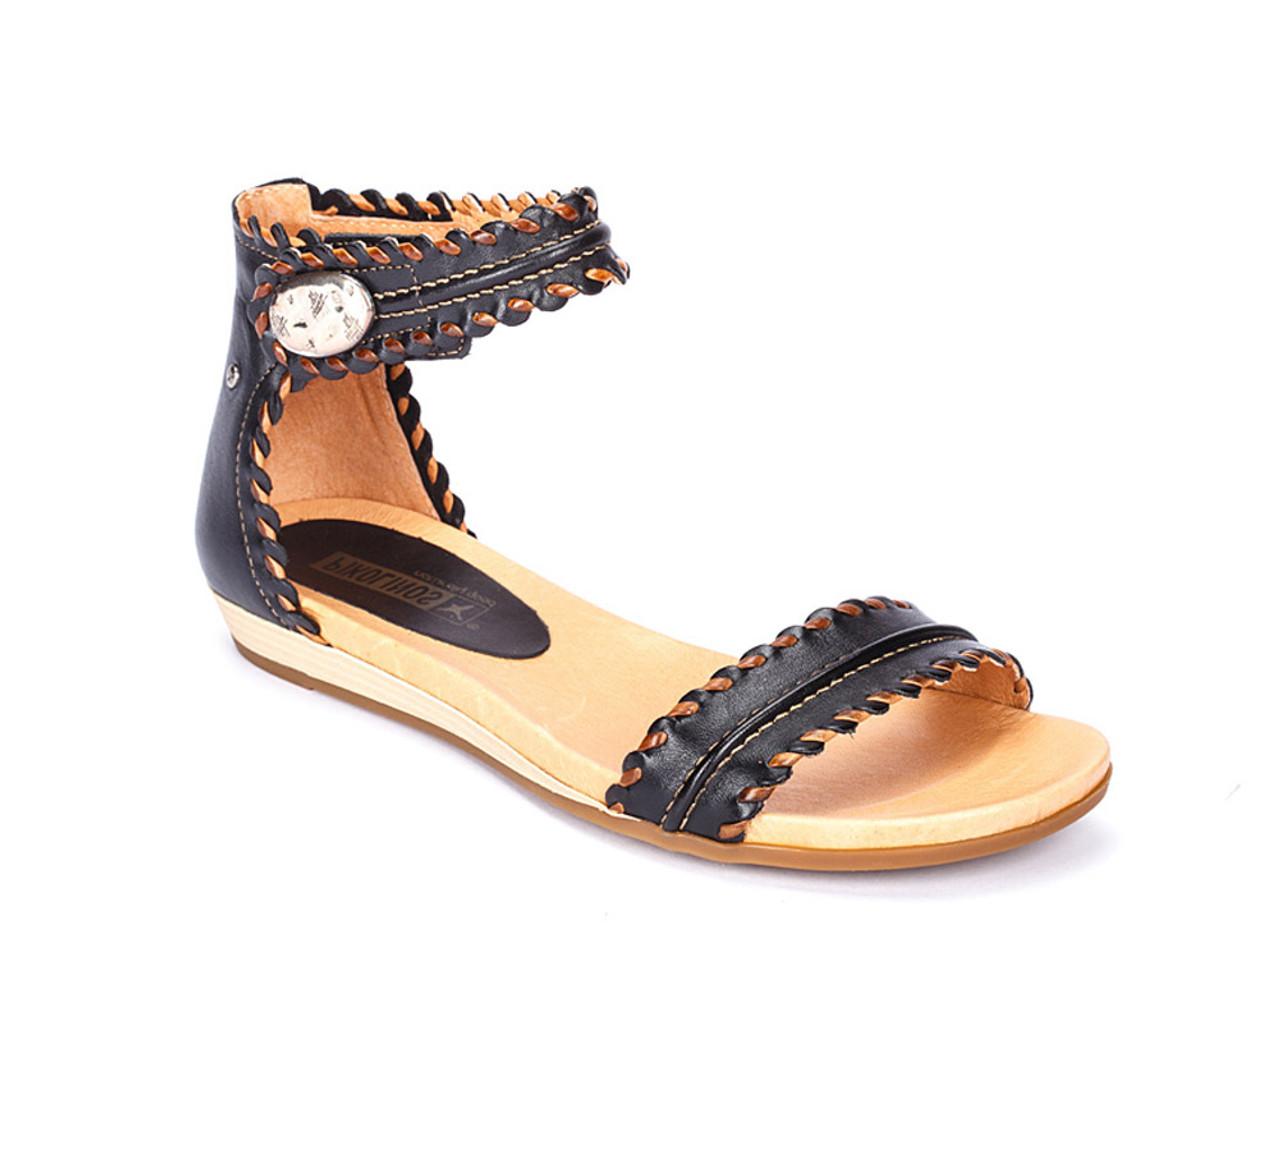 db7aab904a4 Pikolinos Women s Alcudia 816-0657 Sandal Black - Shop now   Shoolu.com